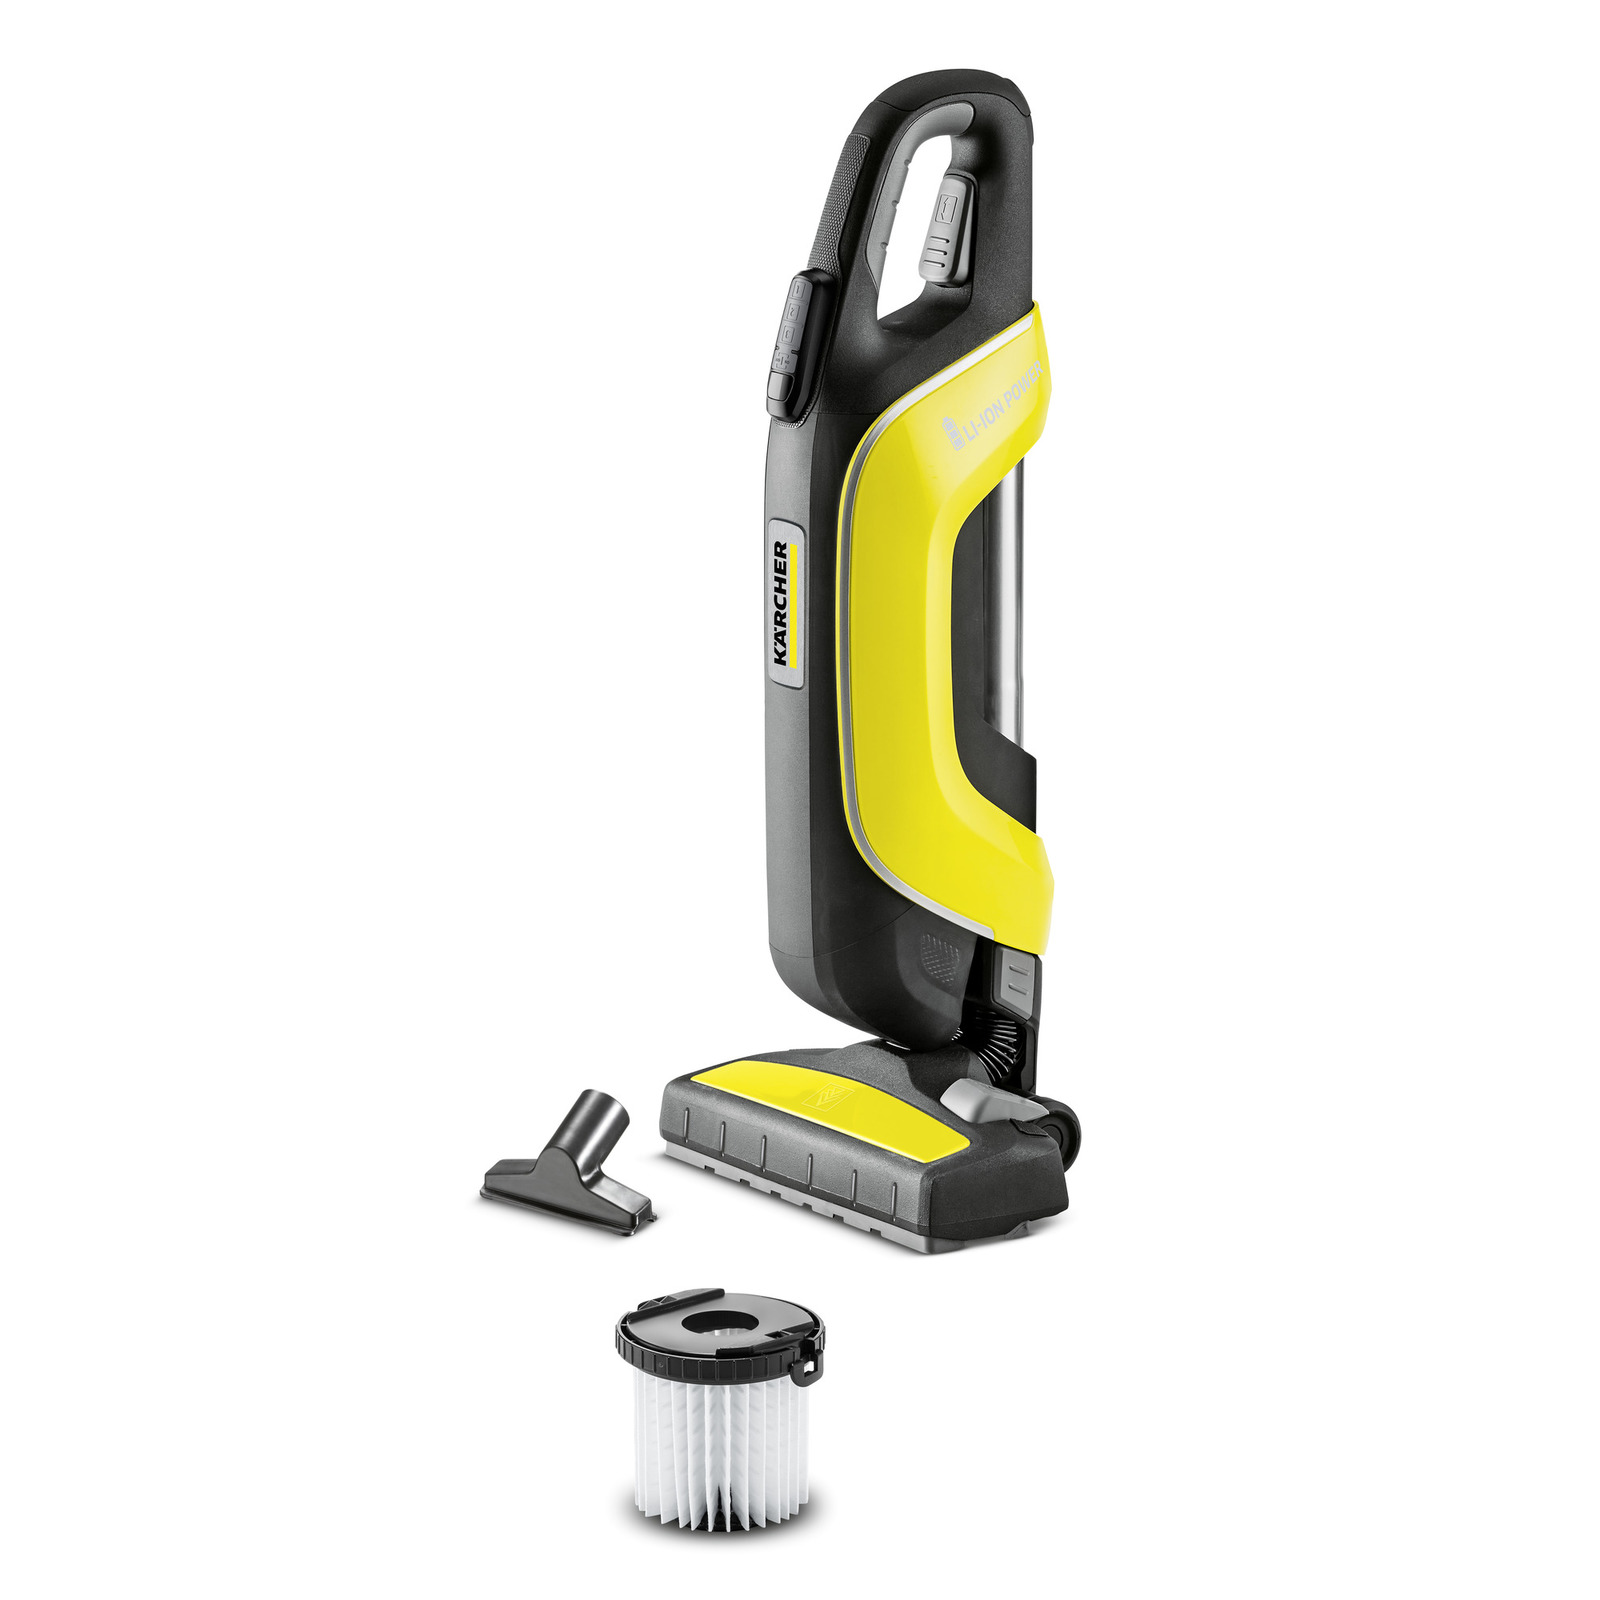 Kärcher - VC 5 Vacuum Cleaner - Cordless